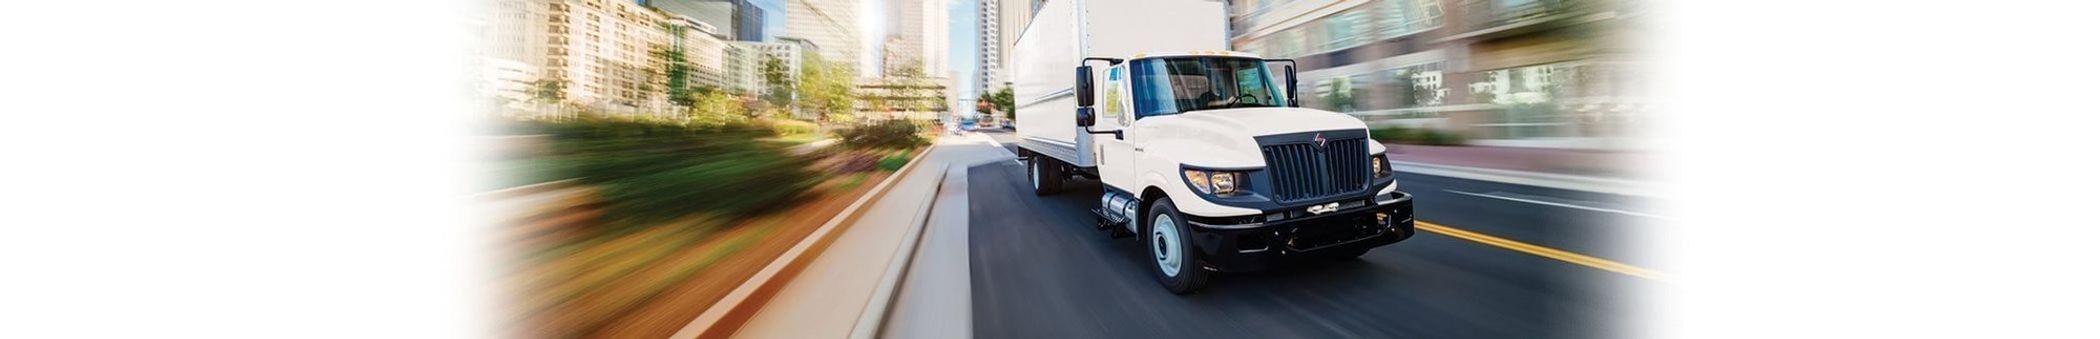 Penske Truck Leasing Logistics Truck Rental Used Trucks Sales